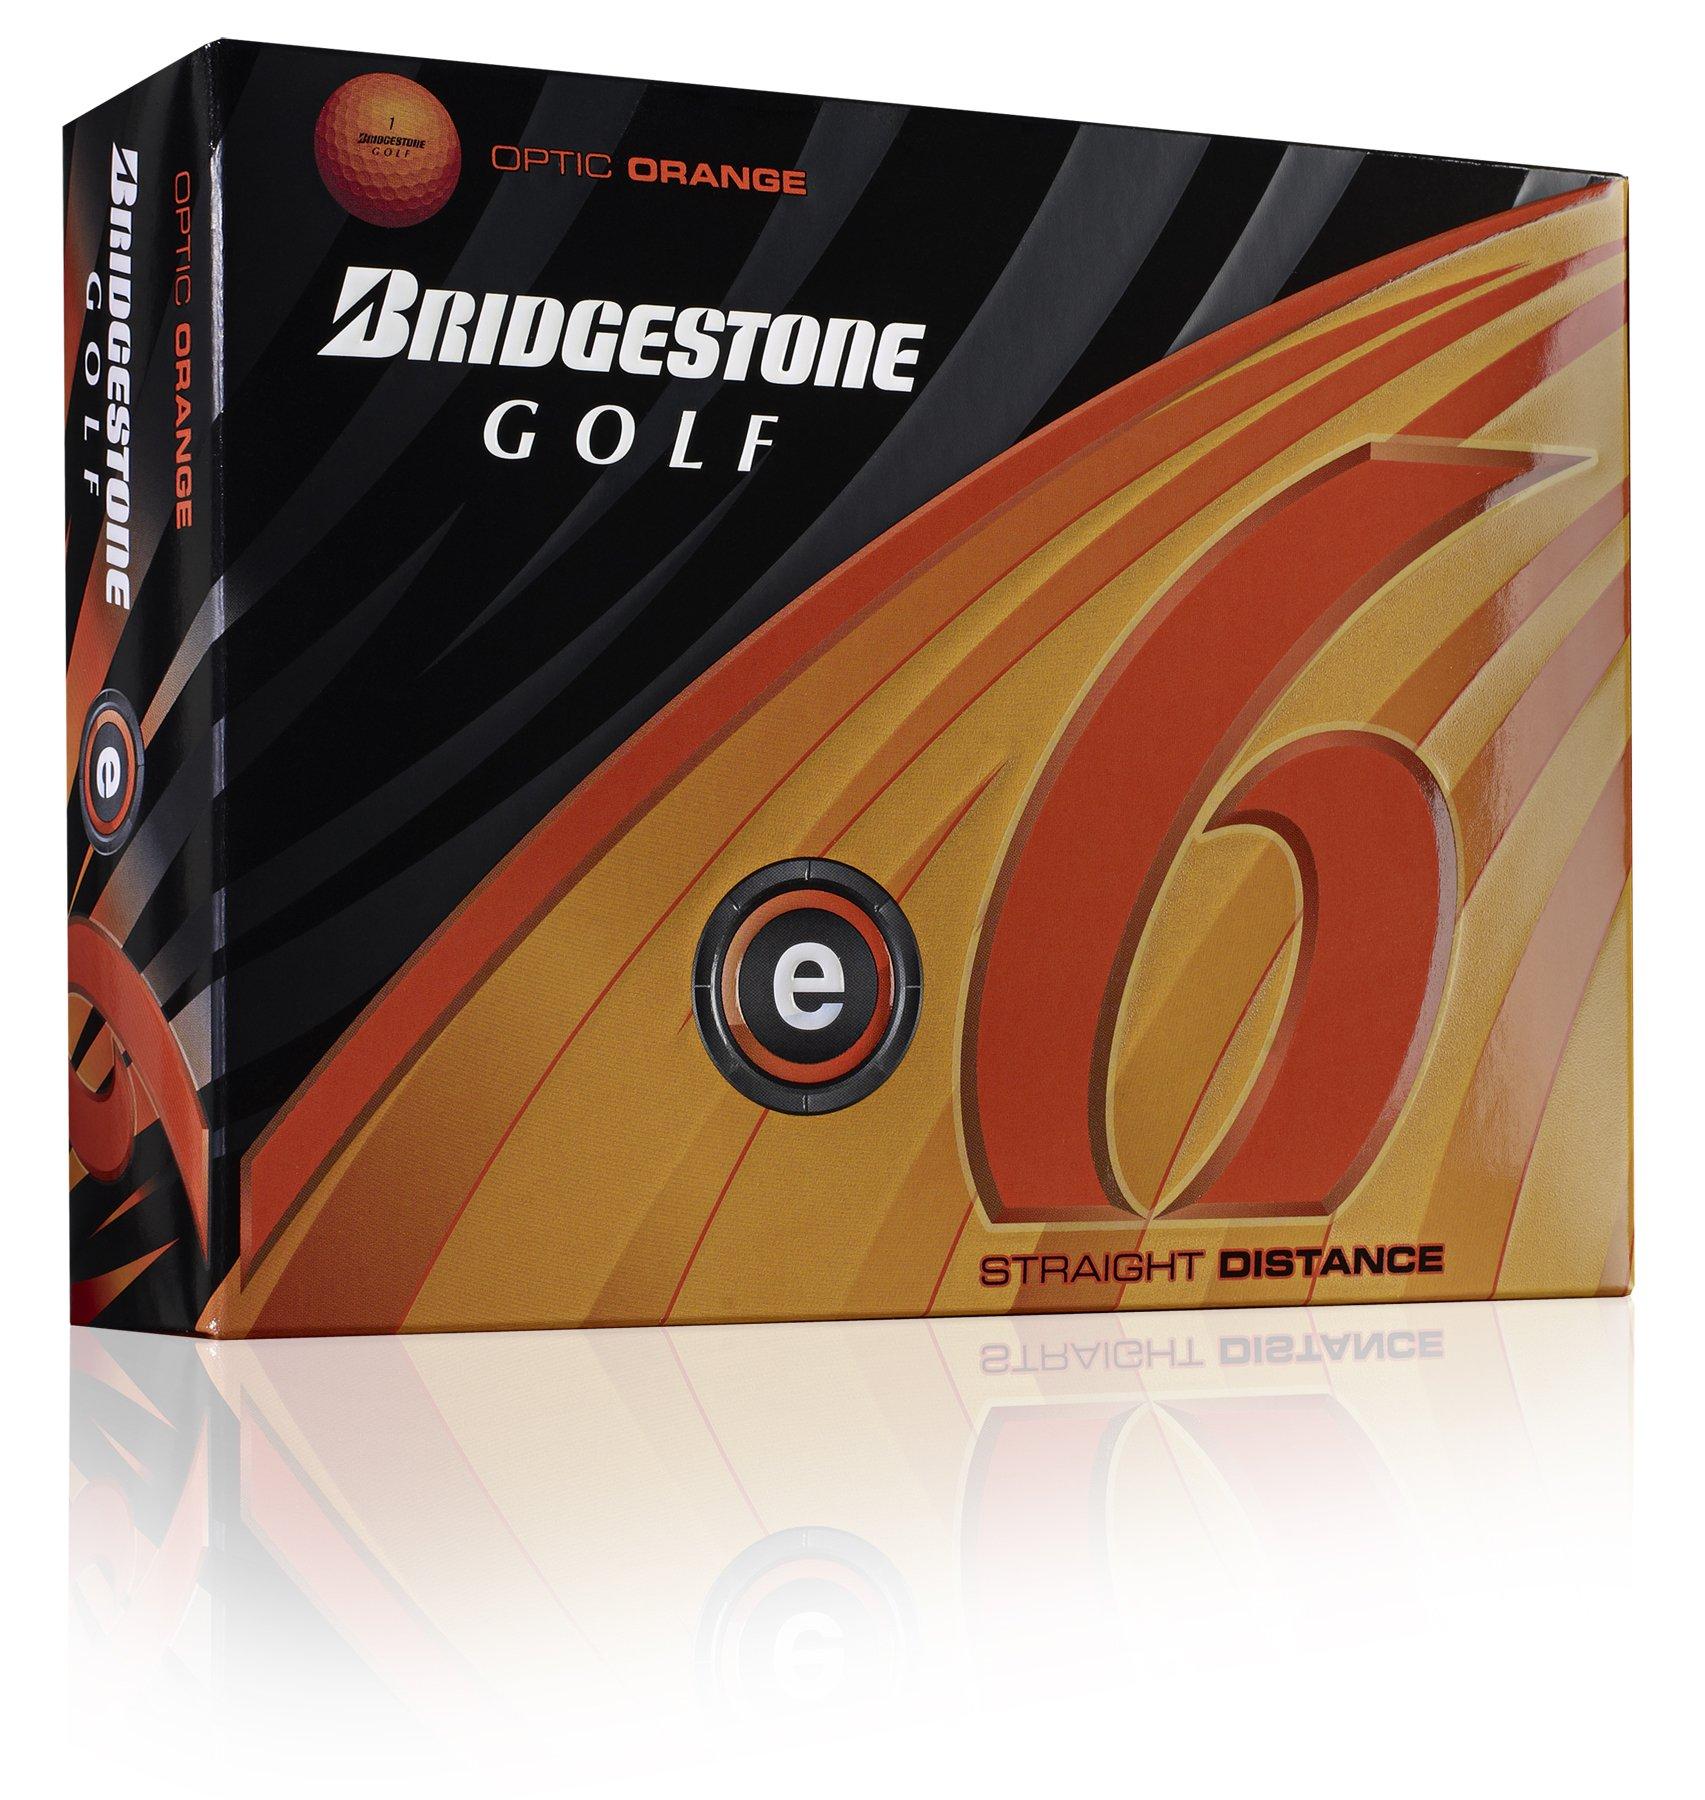 Bridgestone E6 Optic Orange Golf Ball (2011 Model) by Bridgestone Golf